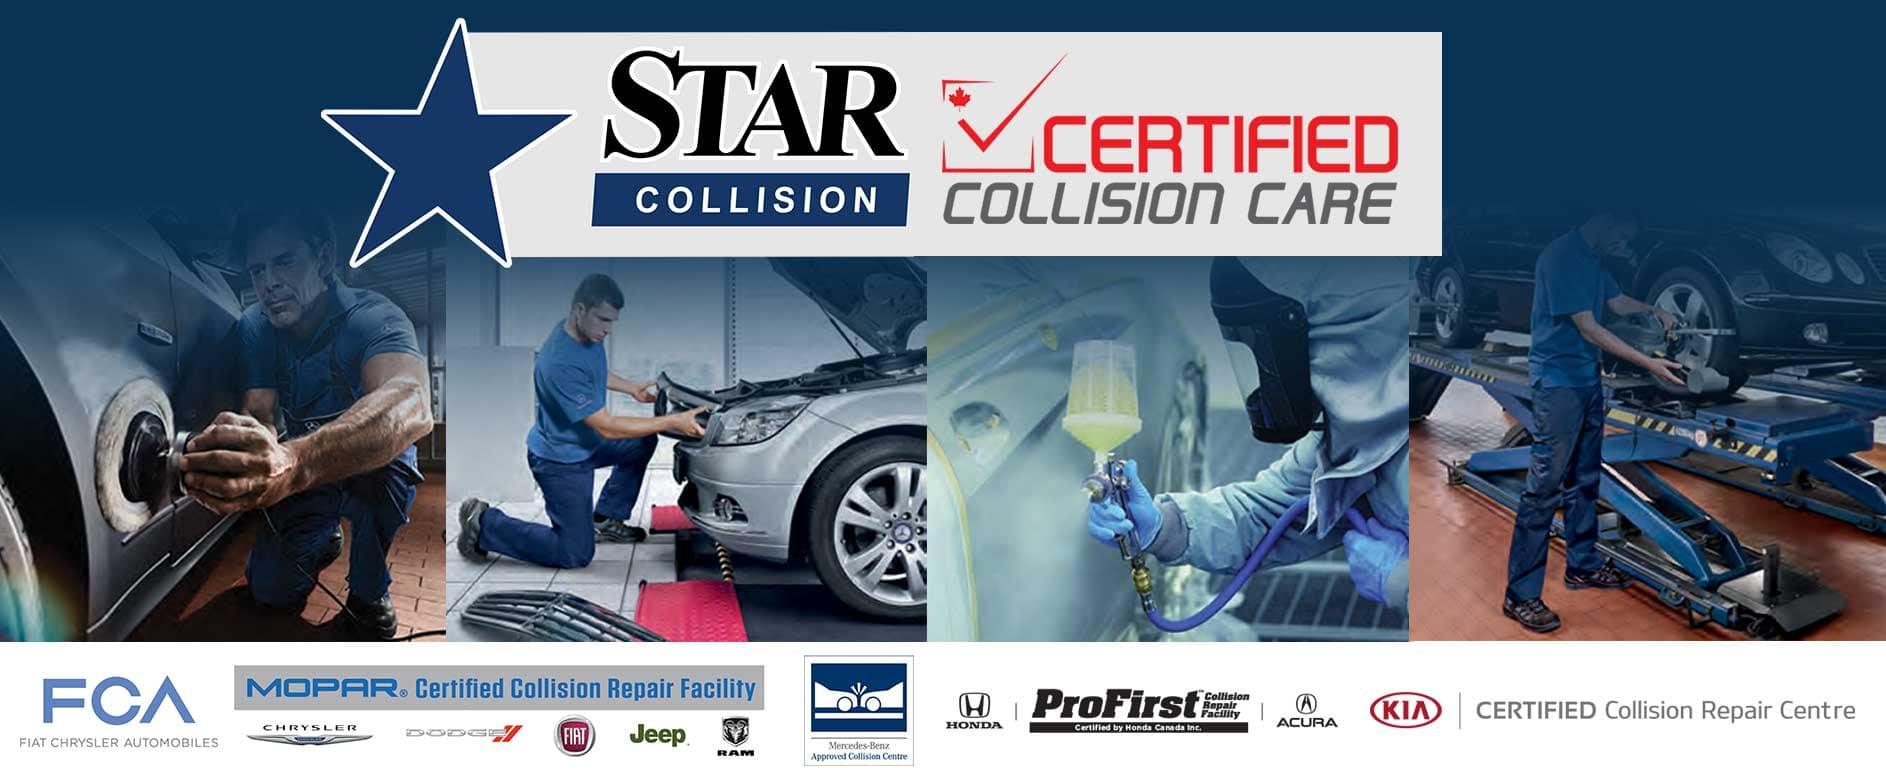 Star Collision Certified Vehicle Repair